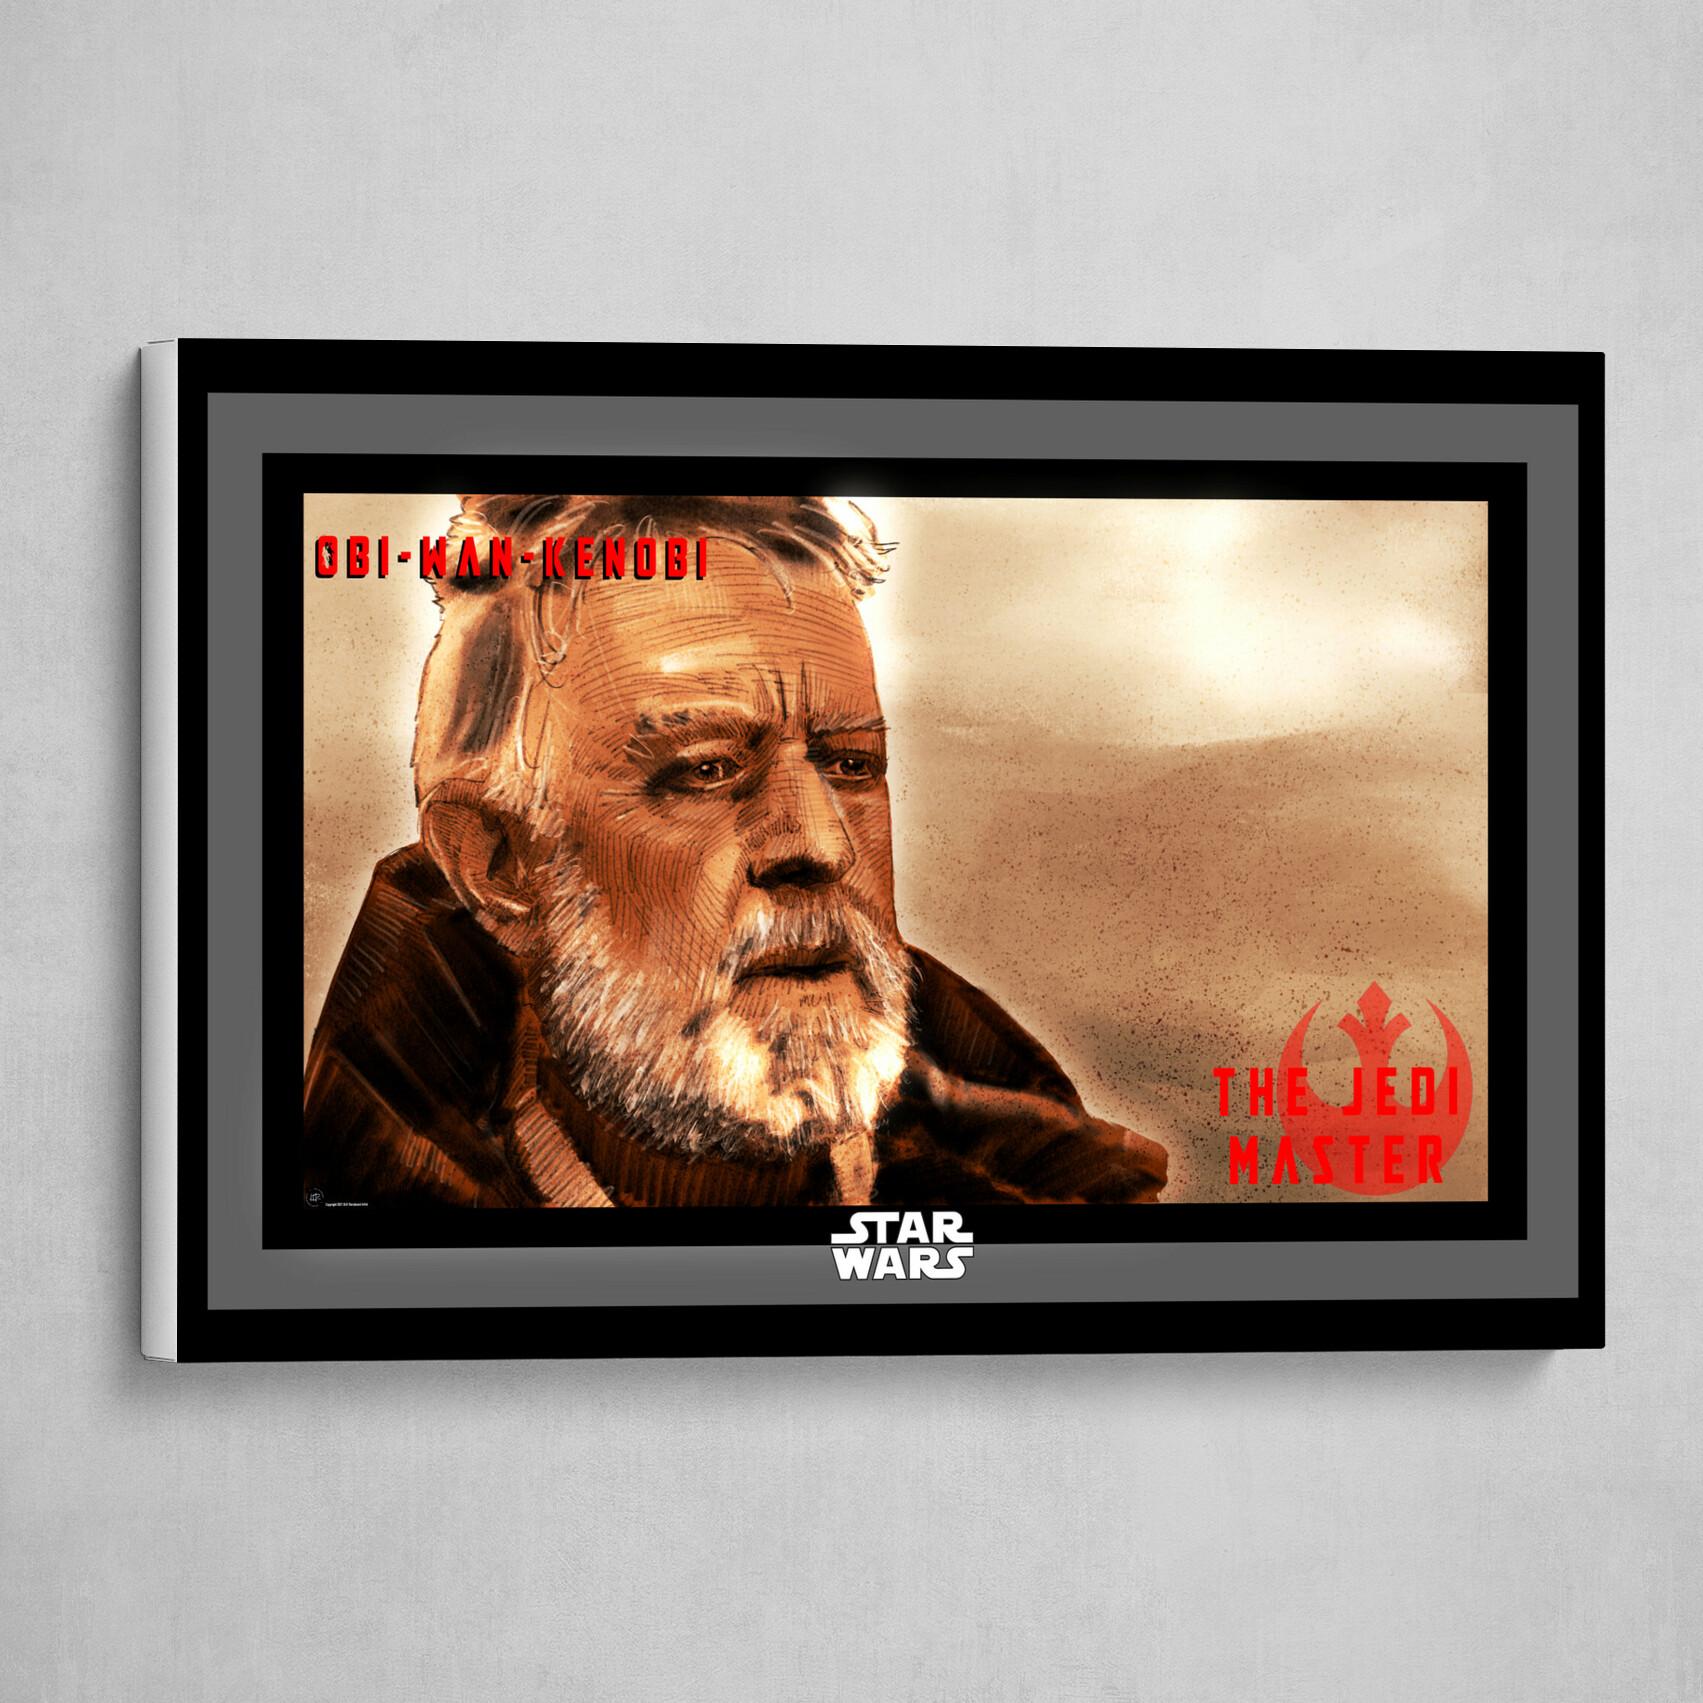 Obi-Wan-Kenobi Poster